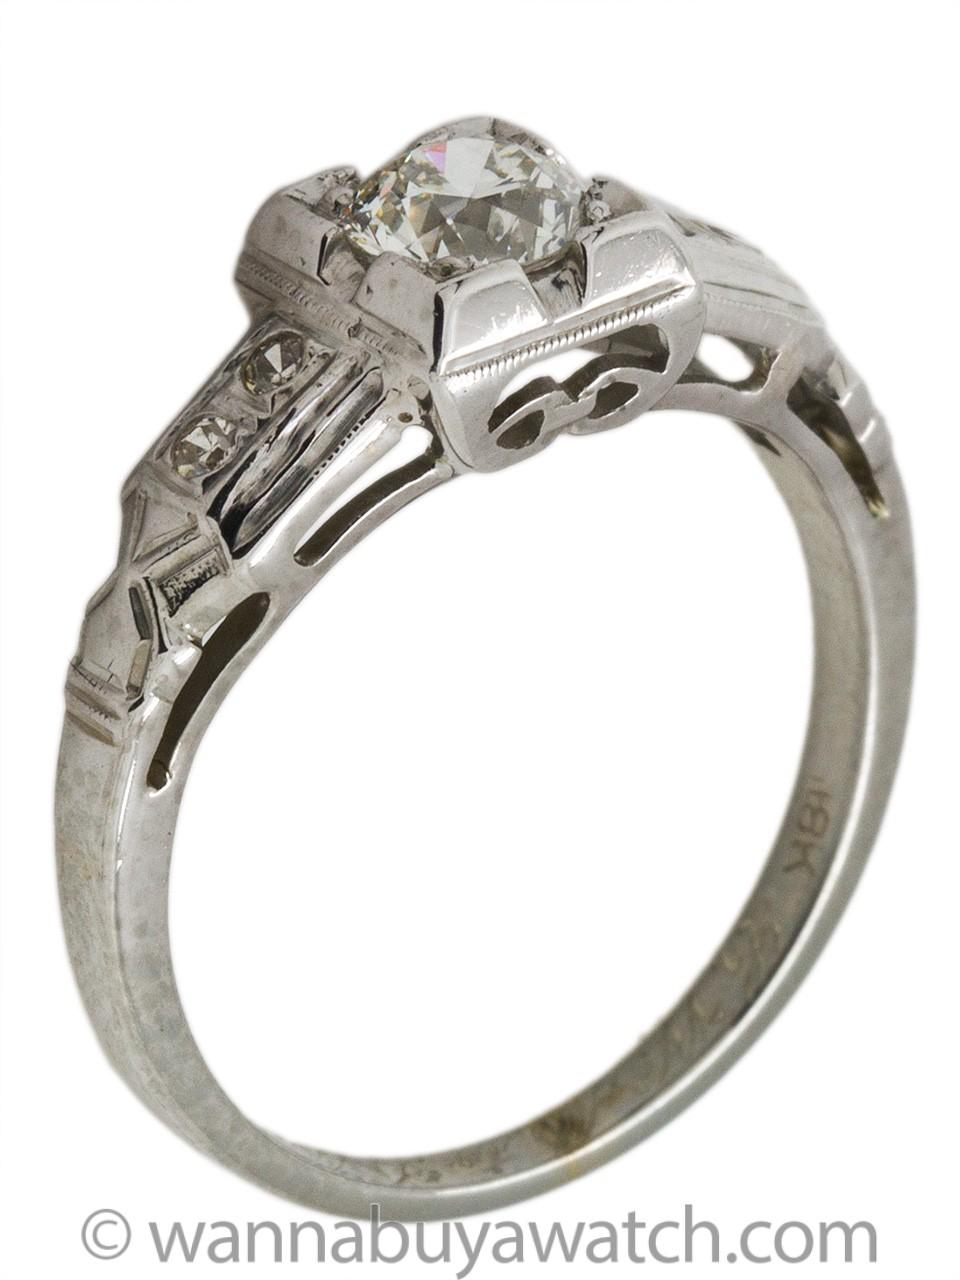 Vintage Art Deco 18K Engagement Ring 0.50ct Old European Cut G-VS1 circa 1930s